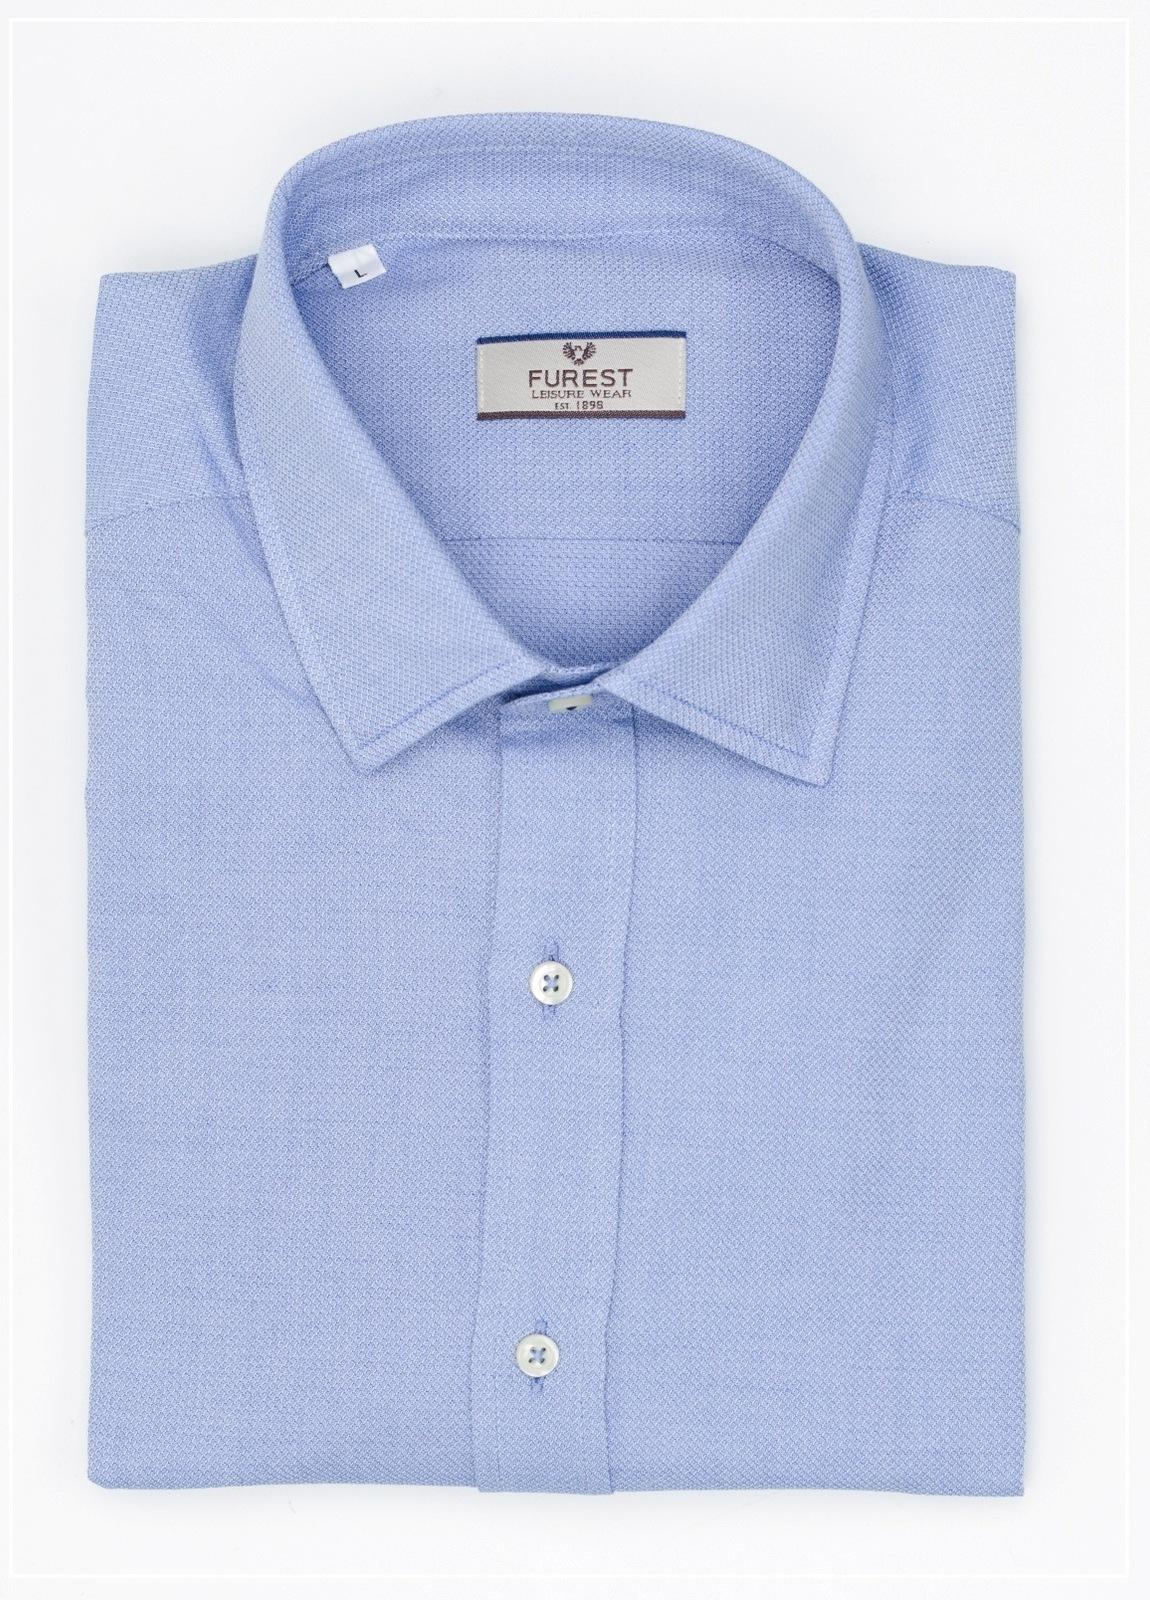 Camisa Leisure Wear REGULAR FIT modelo PORTO lisa color azul 100% Algodón.